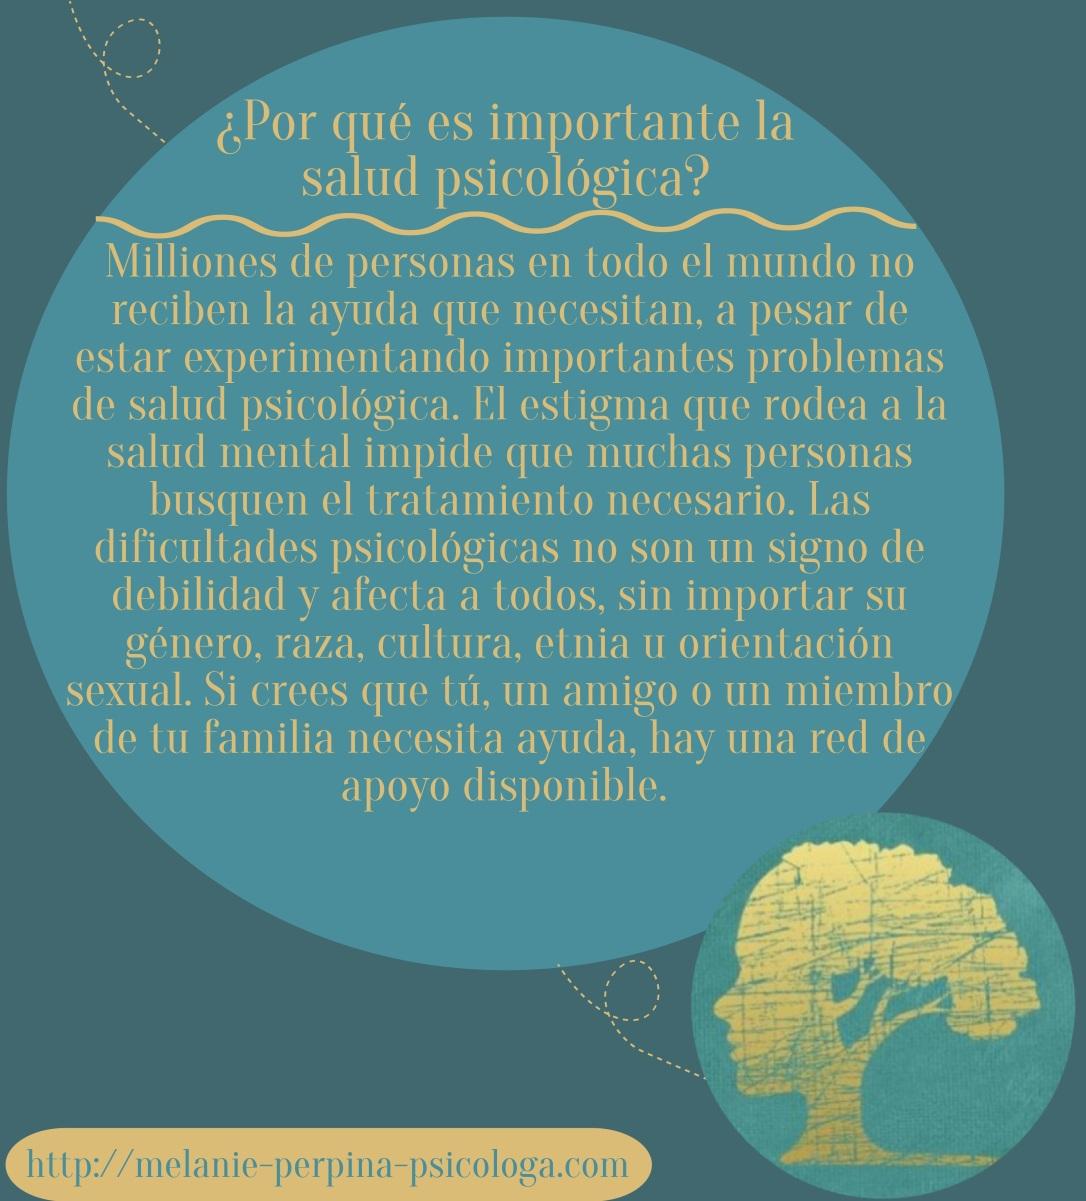 spanish-importa_39384575 (1)_page-0001 cortado